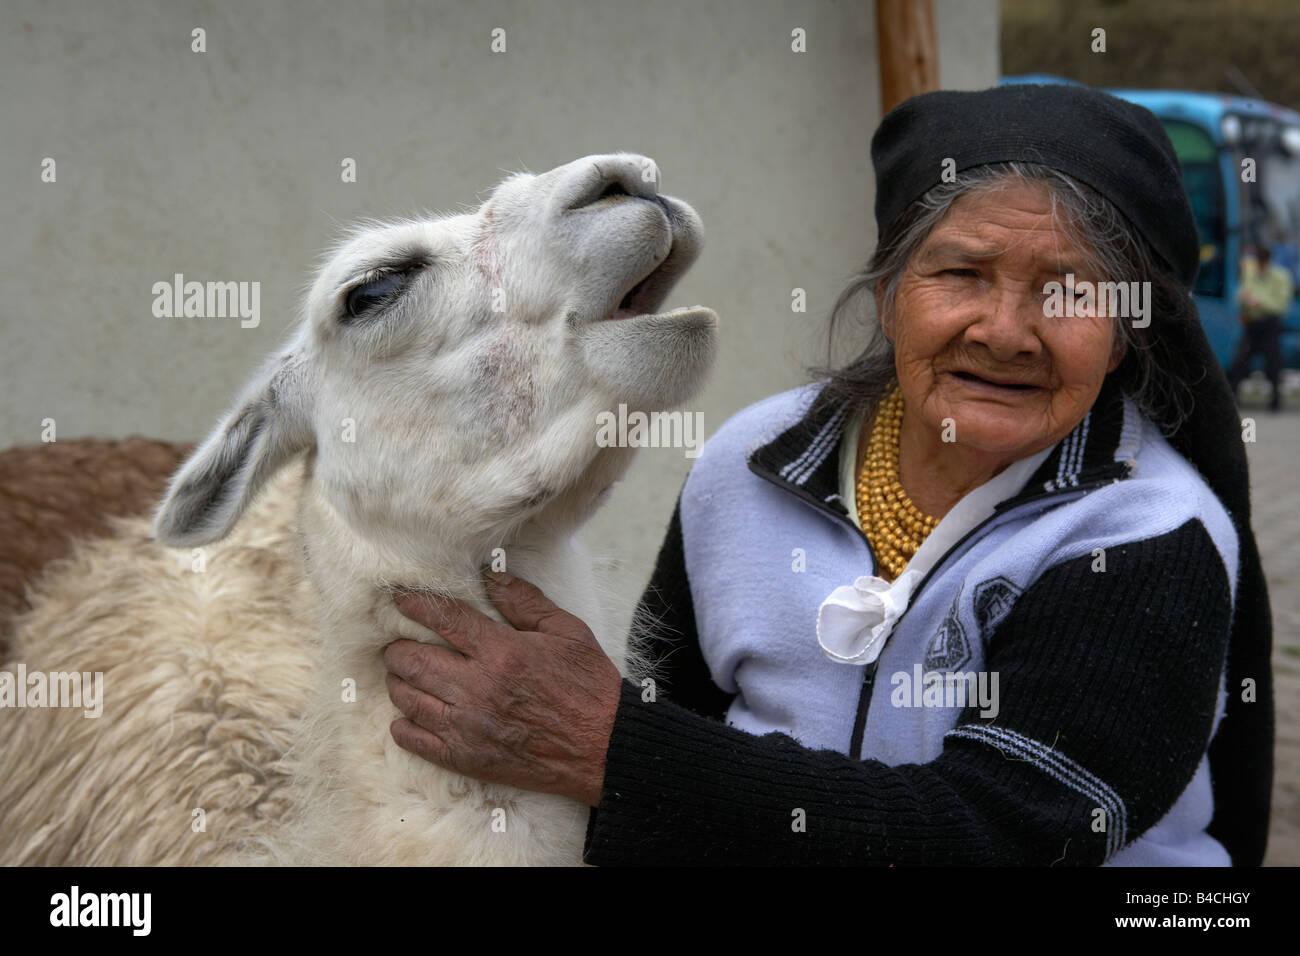 Elderly, Woman with Llama, Otavalo,  Ecuador - Stock Image